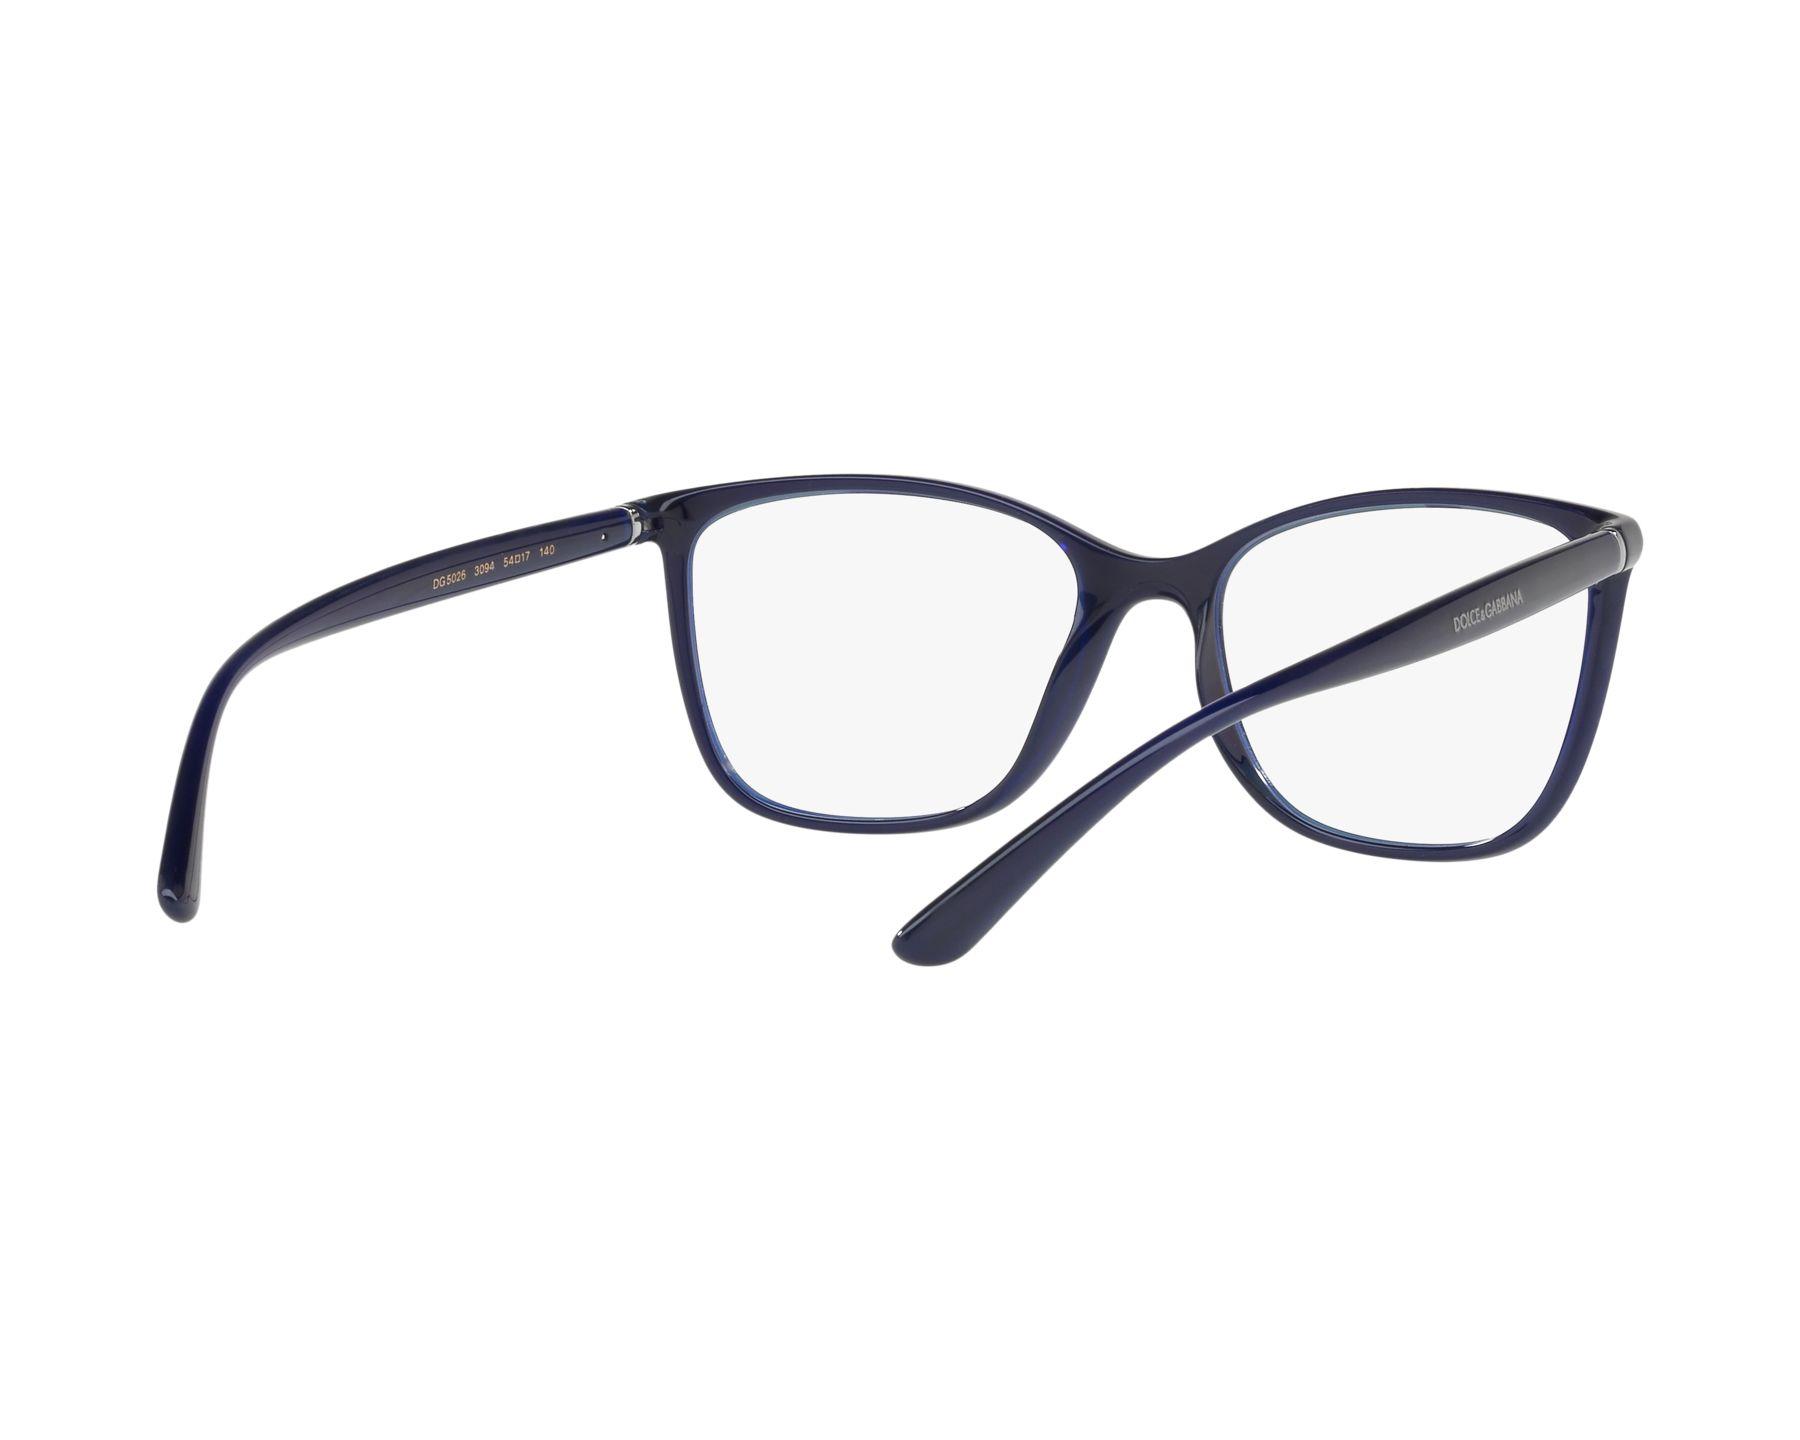 6e689925308 eyeglasses Dolce   Gabbana DG-5026 3094 54-17 Blue 360 degree view 8